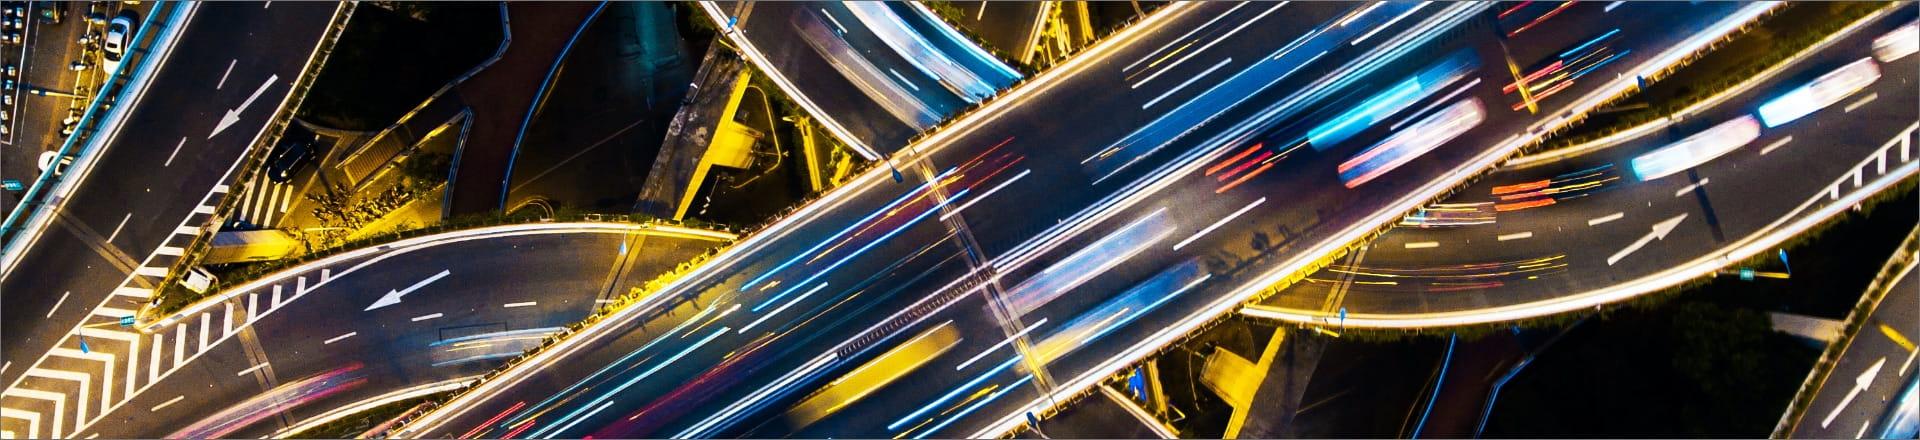 Moving traffic at night